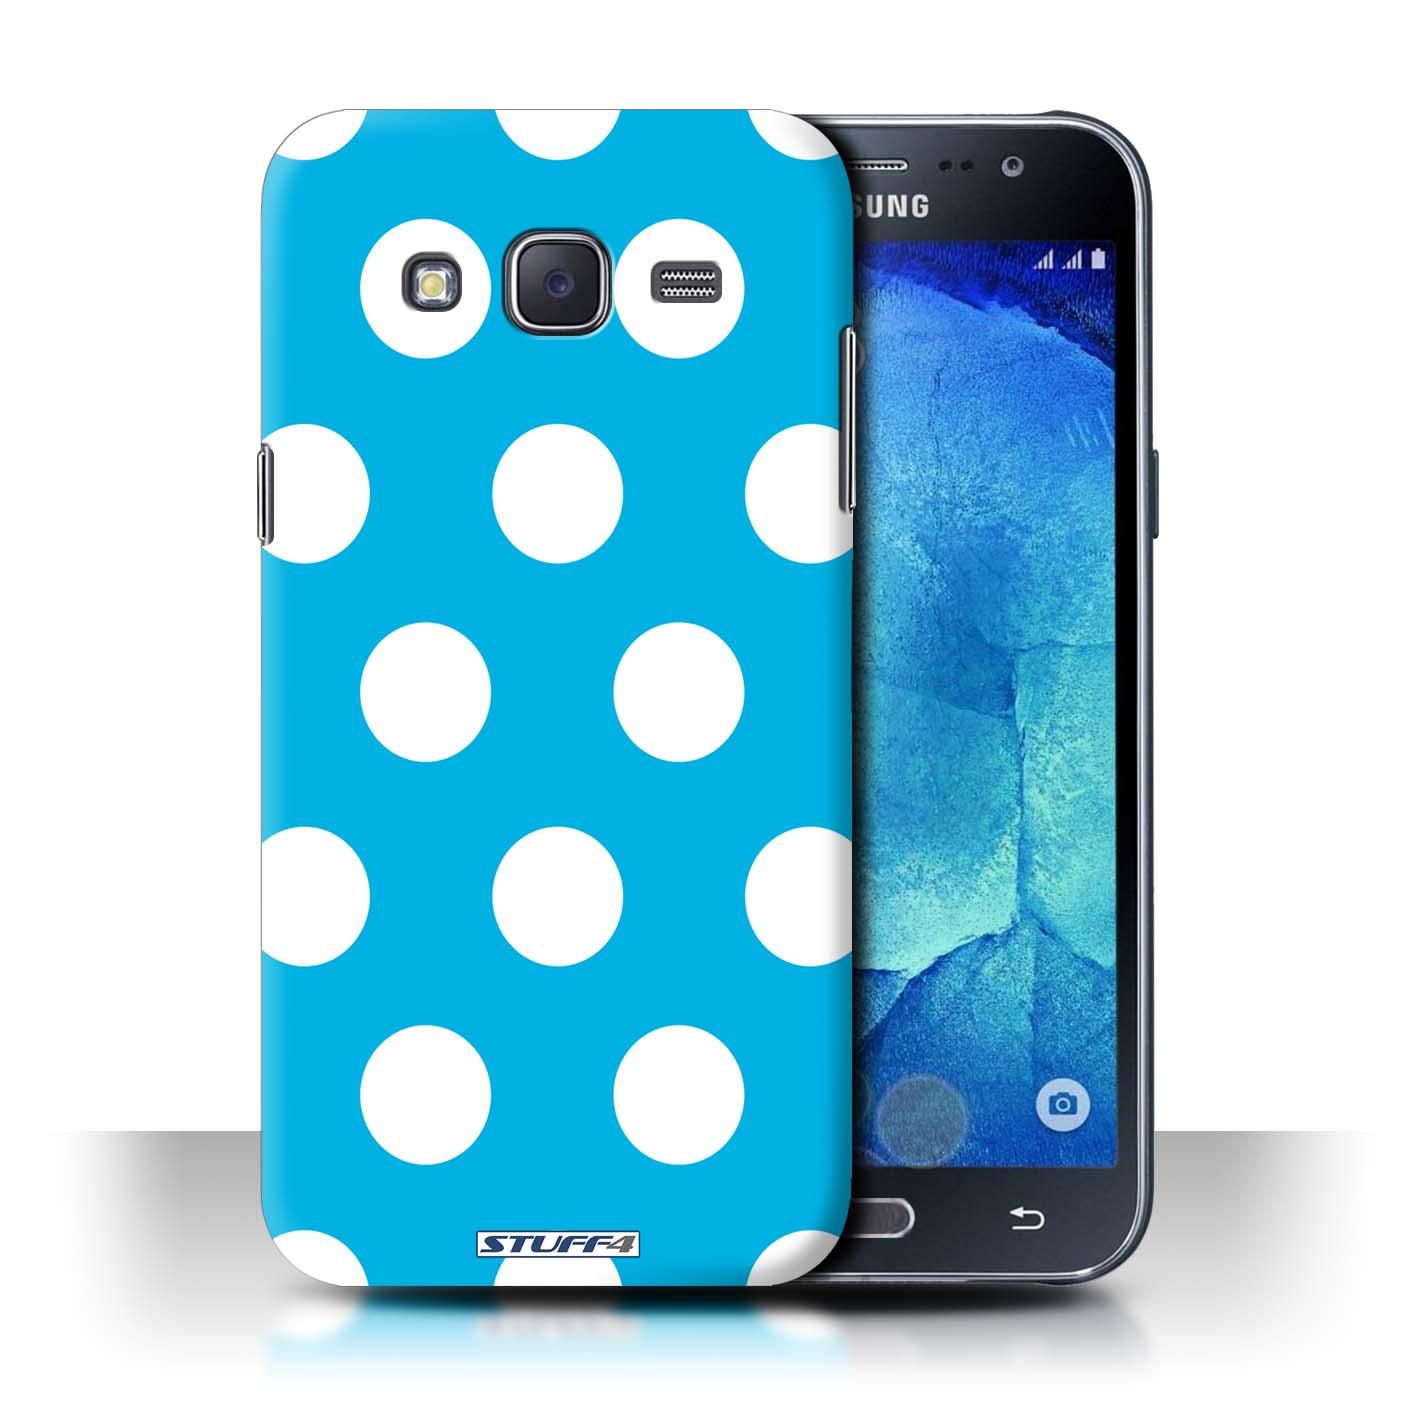 stuff4 phone case back cover for samsung galaxy j5 j500 polka dot